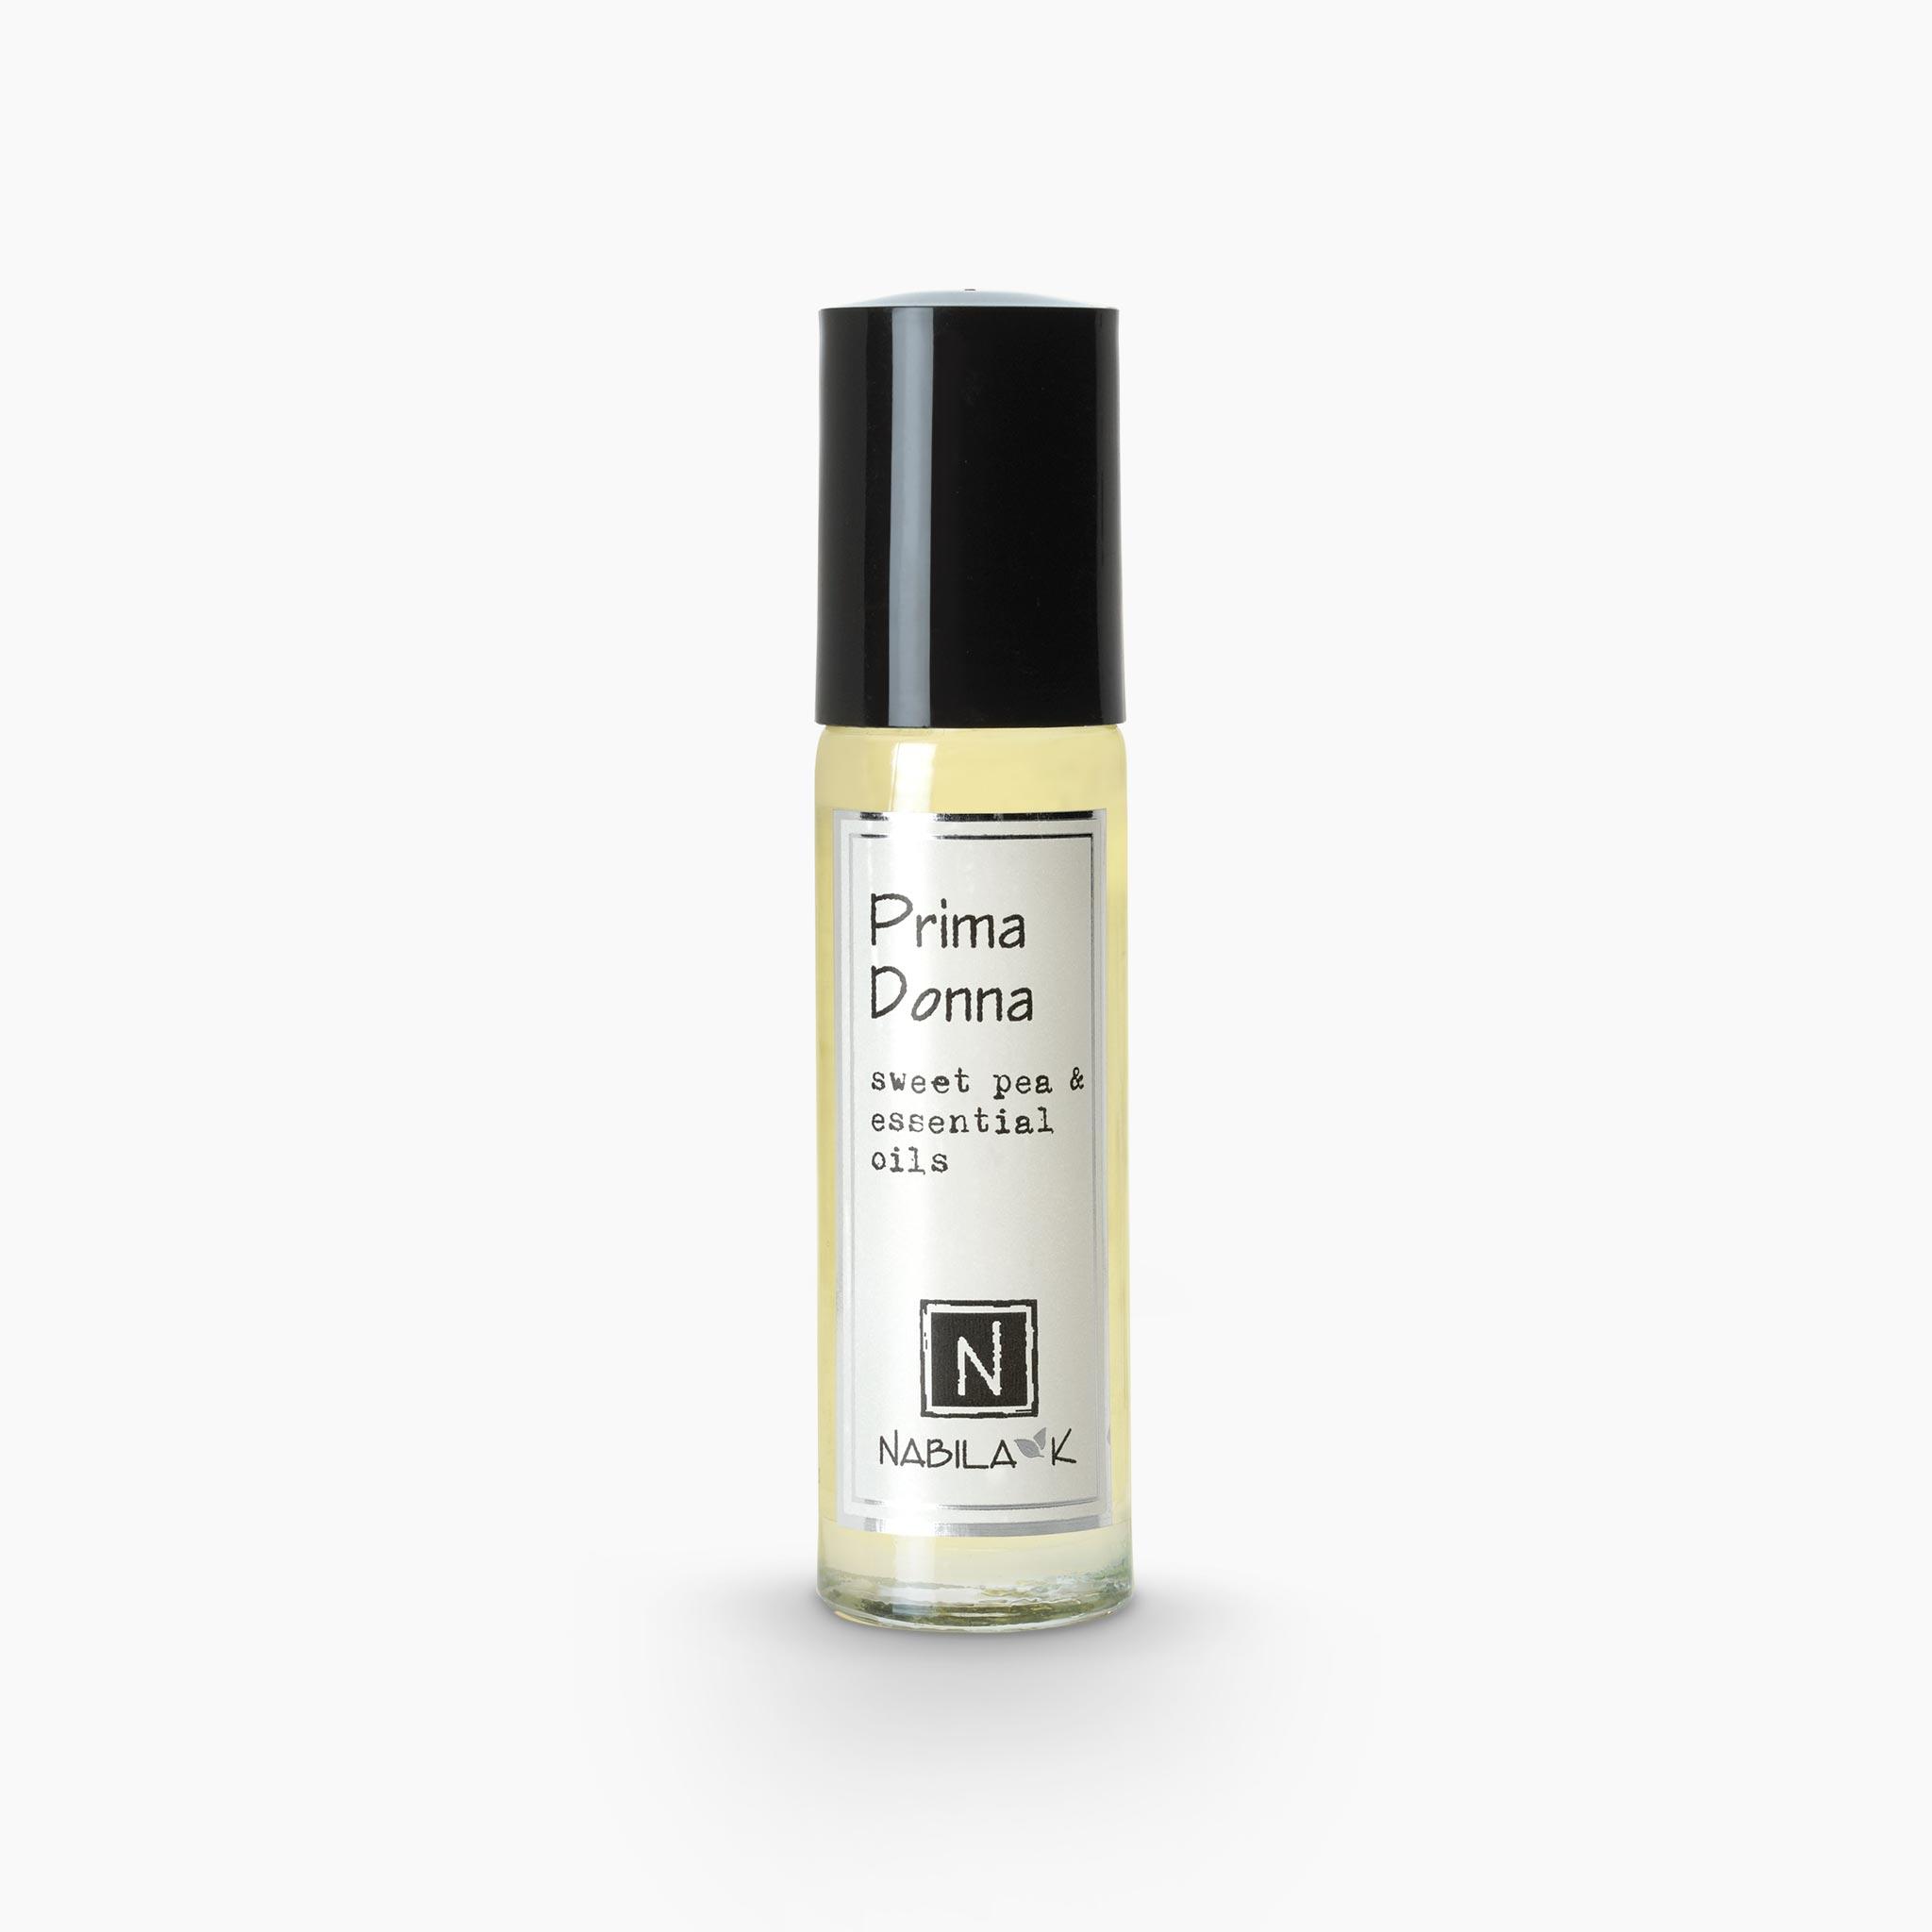 .33oz of Nabila K's Prima Donna Sweet Pea and Essential Oils Roll on Perfume